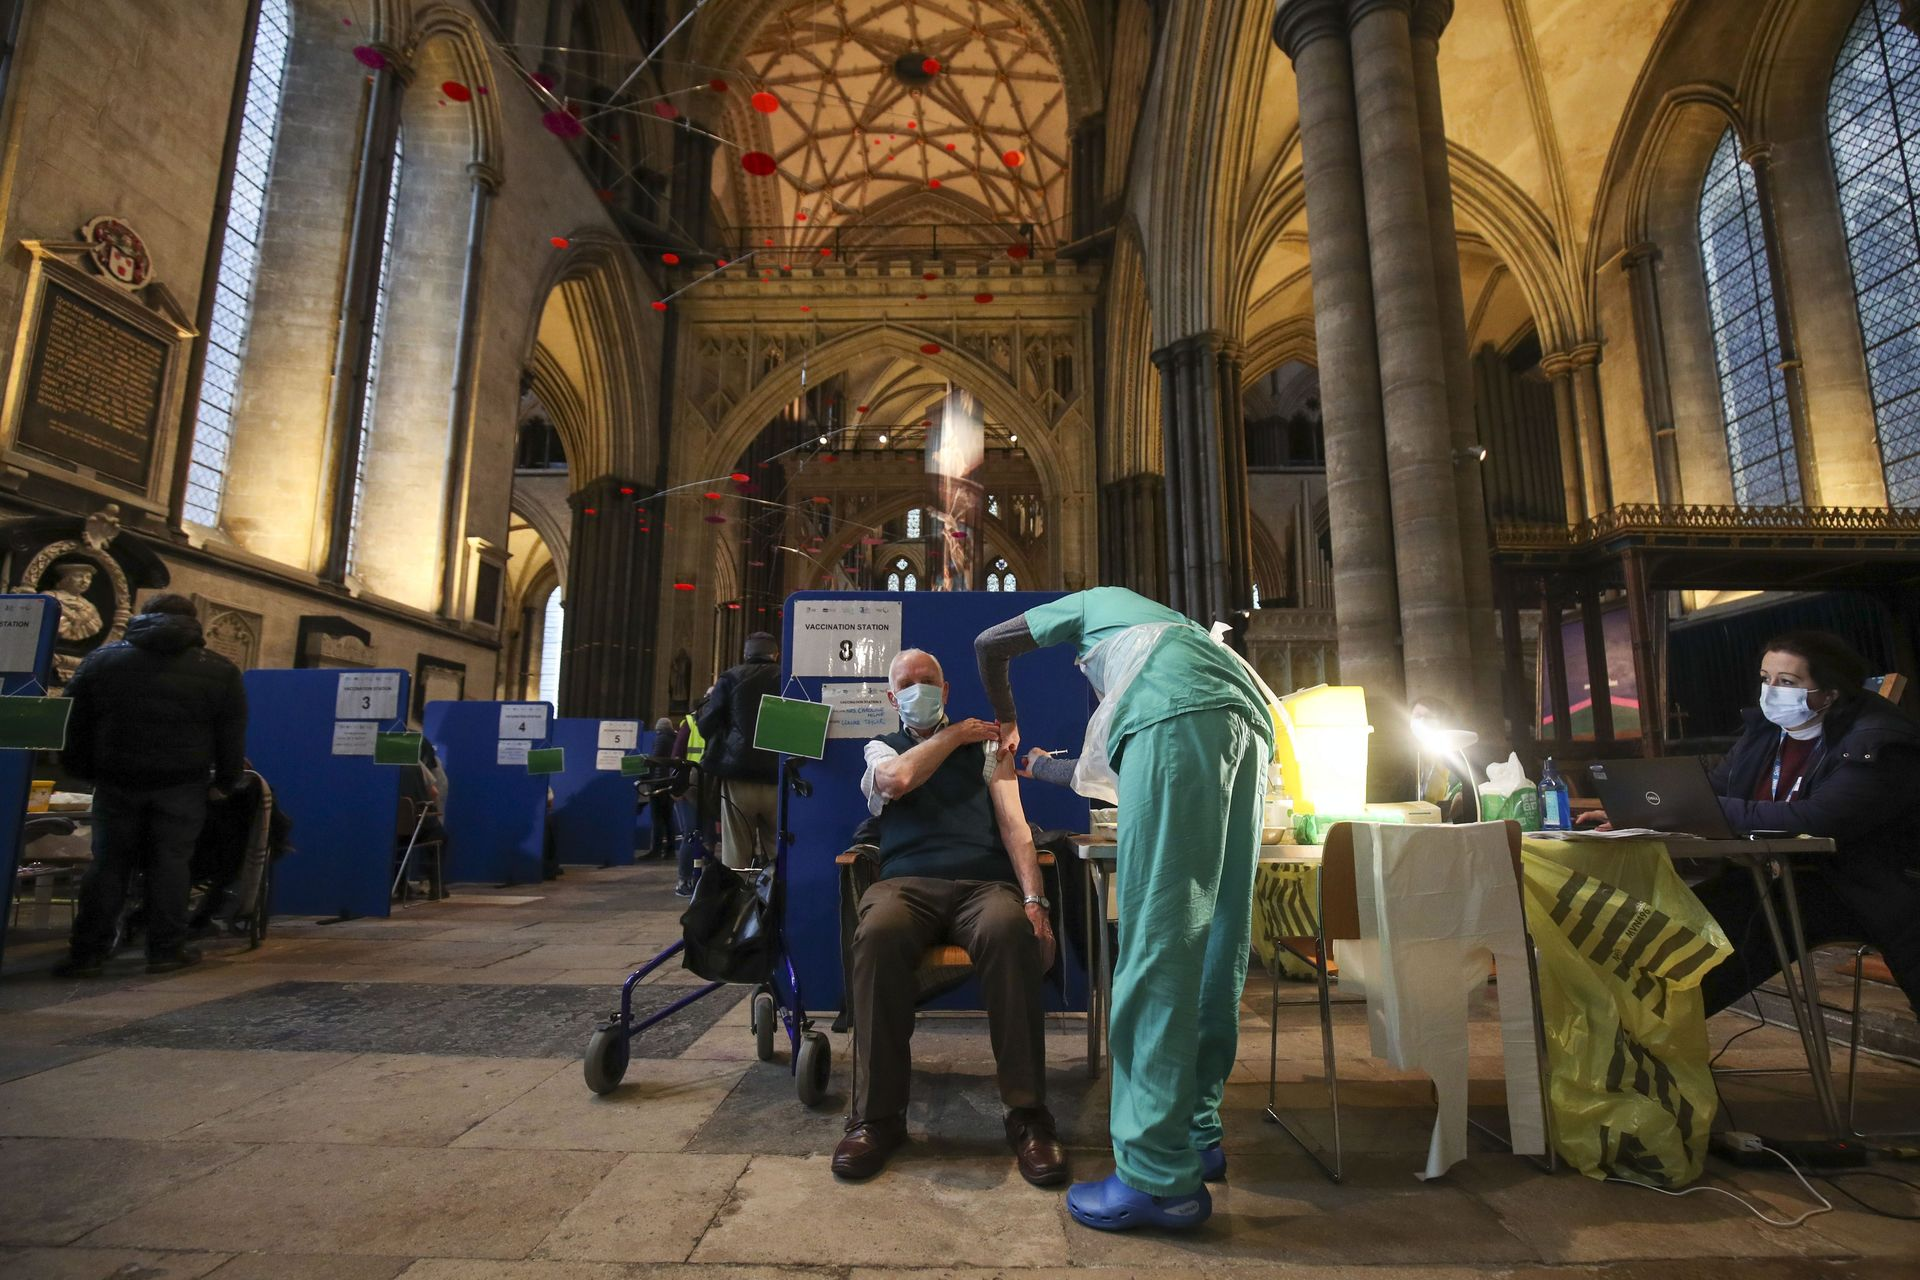 vacunacion-iglesia-medieval-salisbury-reino-unido-covid-1910.jpg